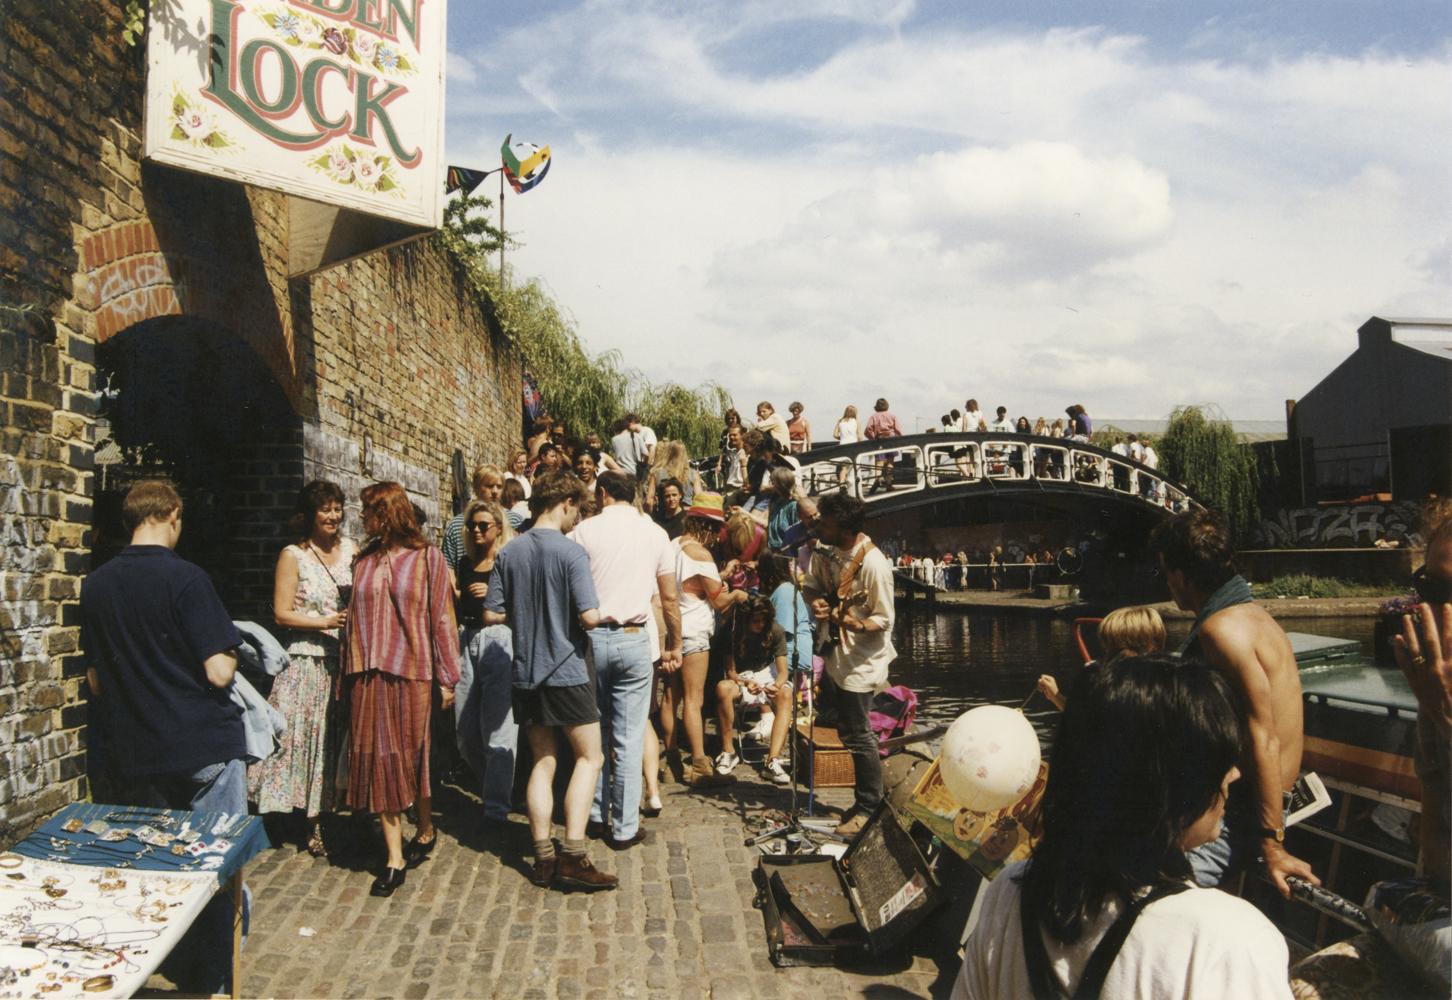 198 Camden Lock Aug 1991